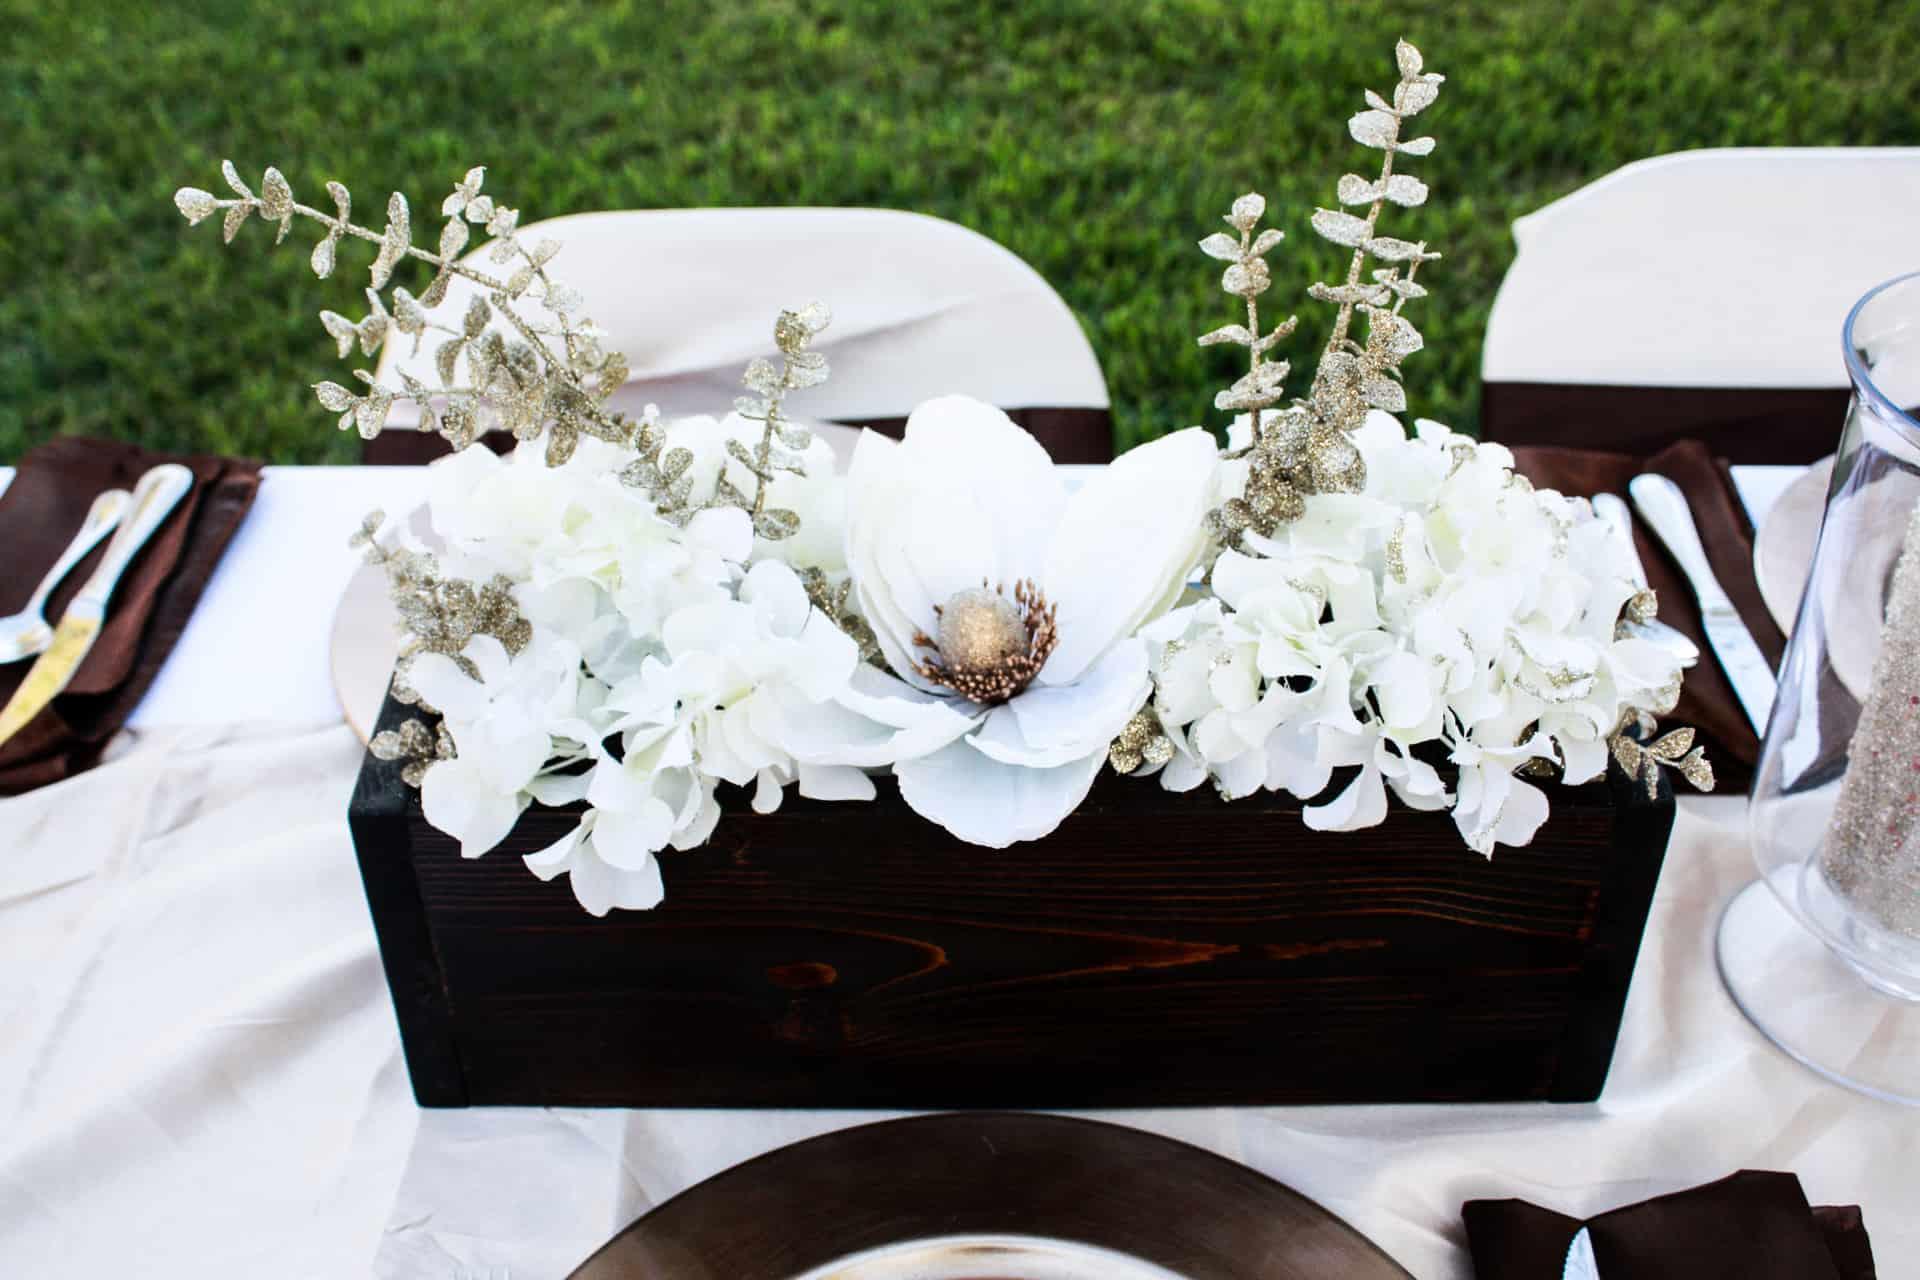 DIY Wood Planter Box - table decor